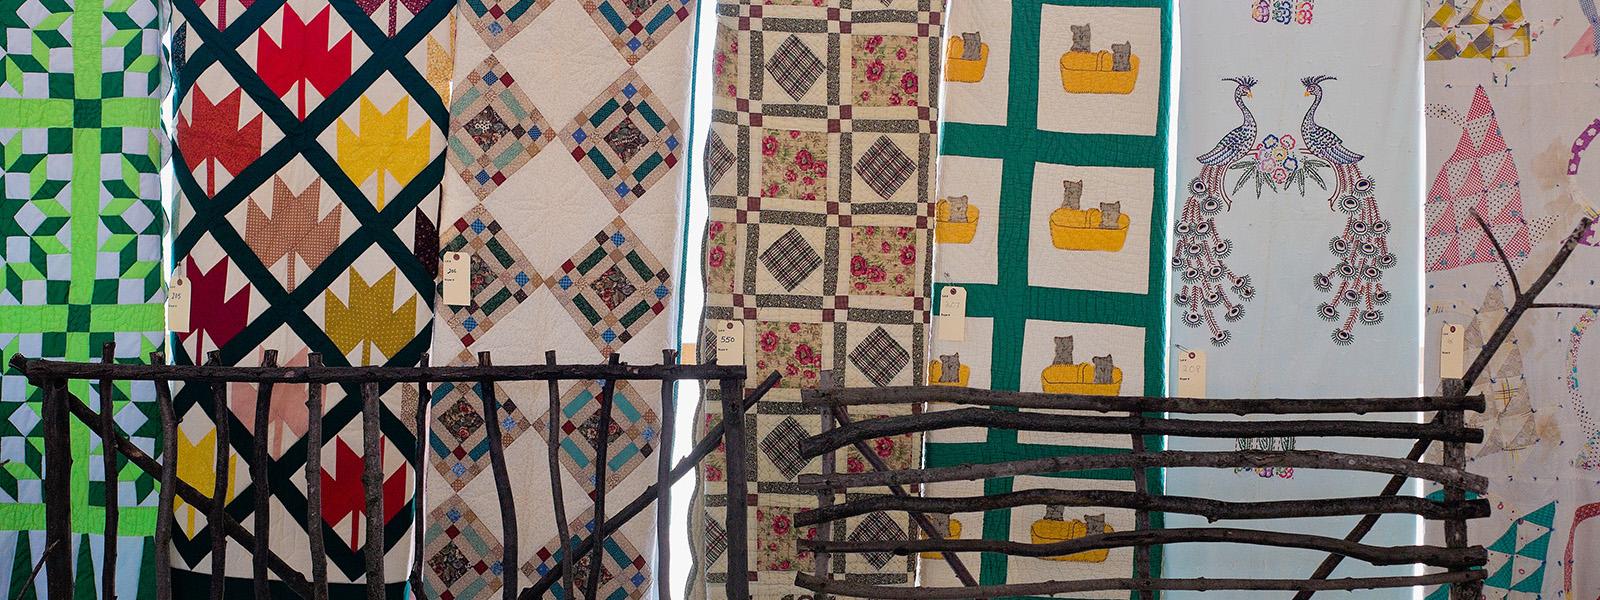 Quilts hanging at Amish auction, Fordsbush Road